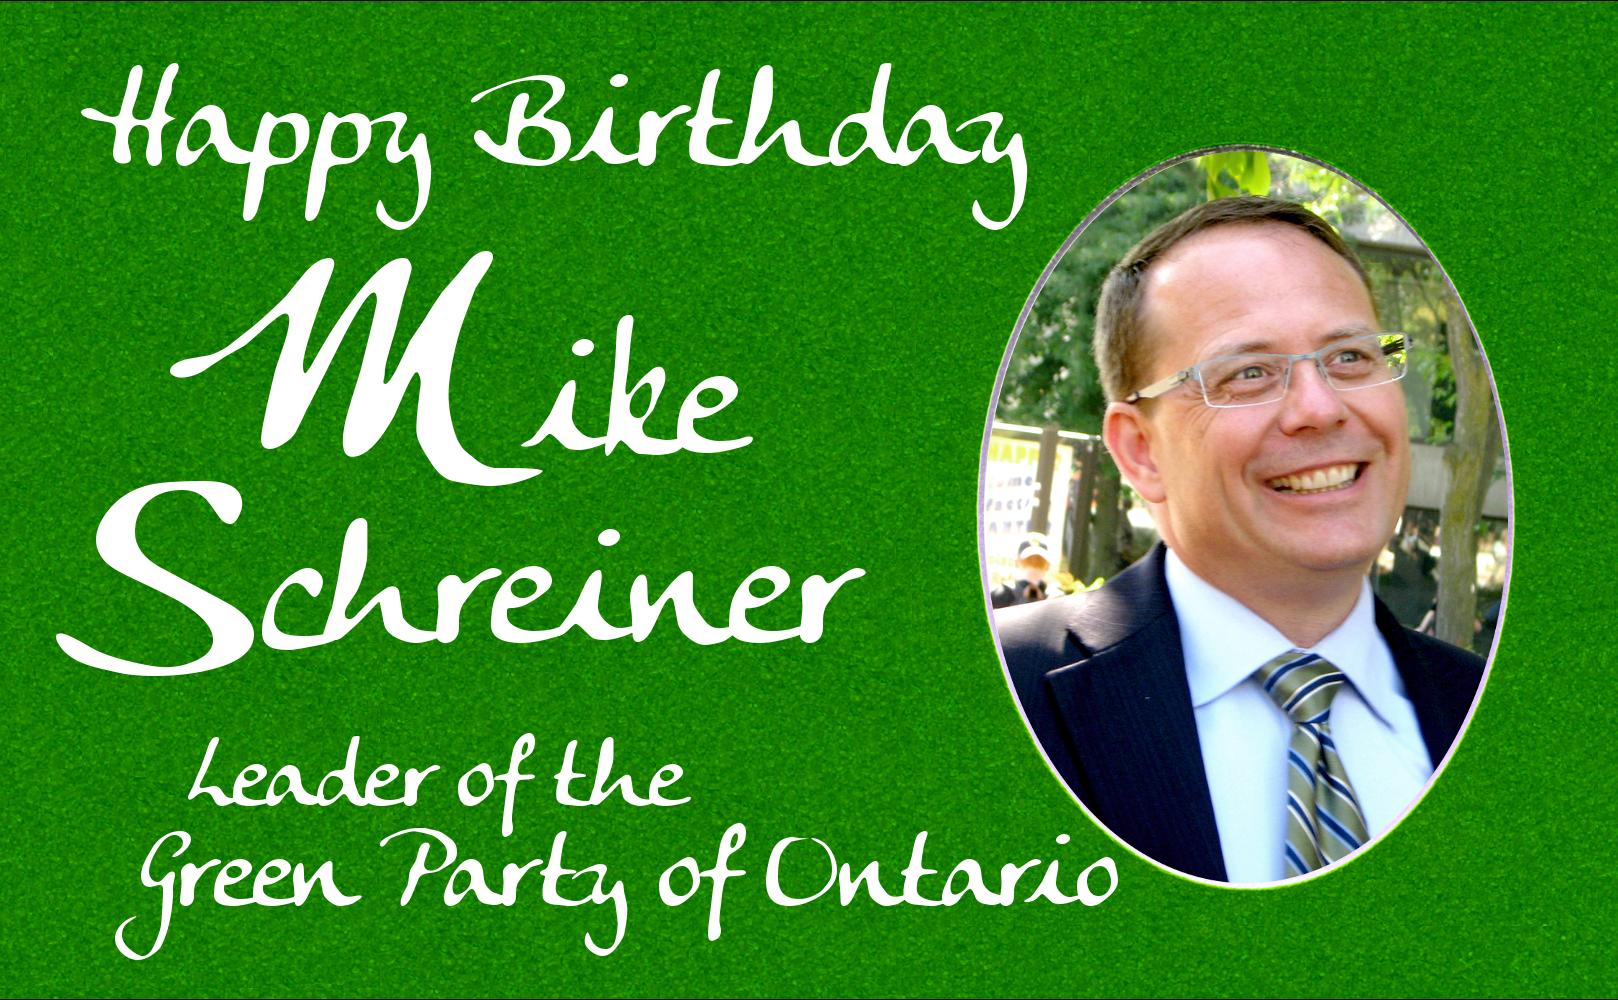 Happy Birthday Mike!